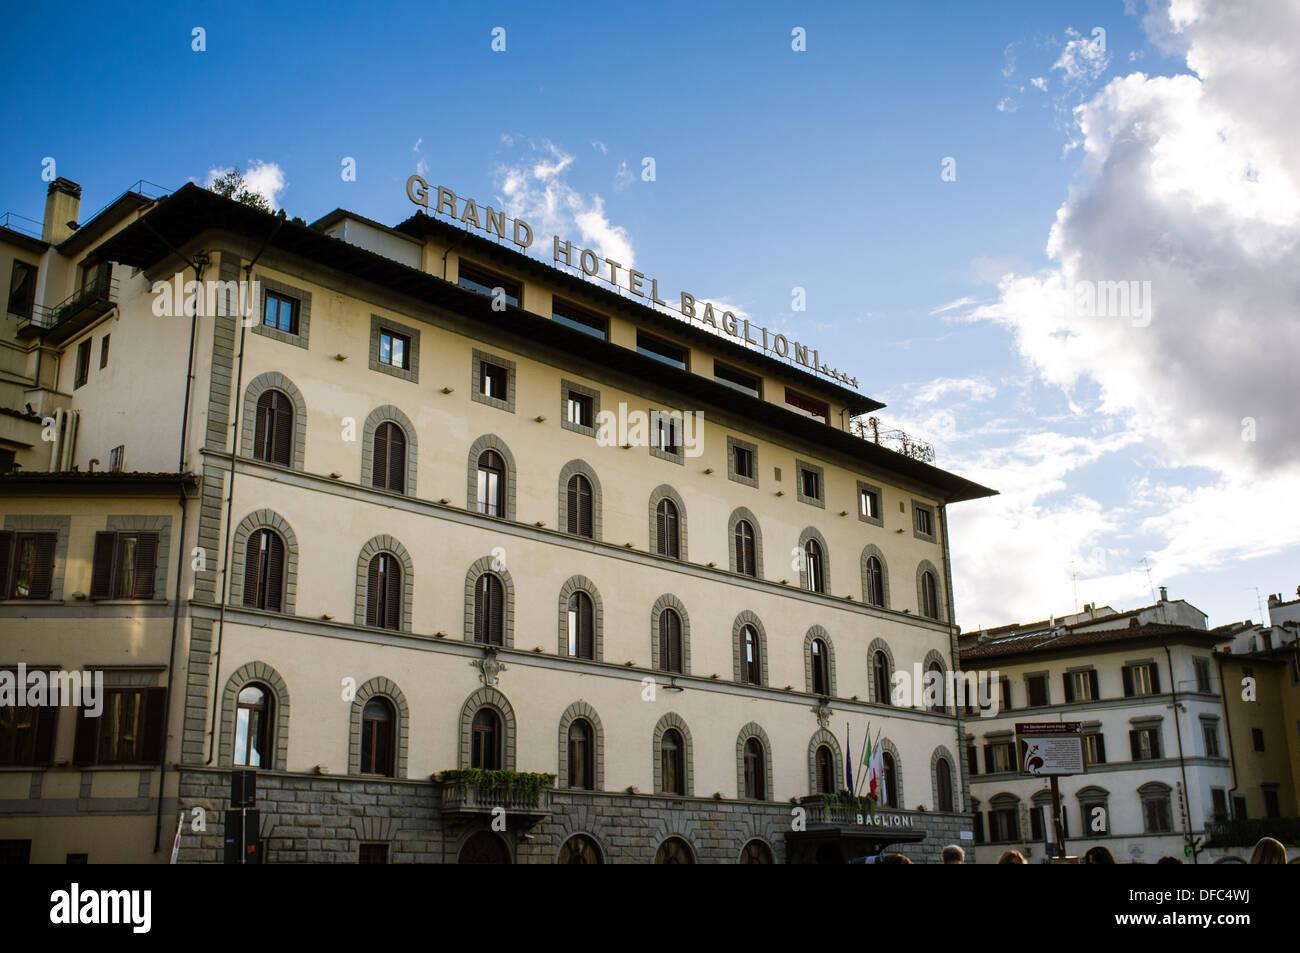 Grand Hotel Baglioni Florenz Italien Stockfoto Bild 61118222 Alamy